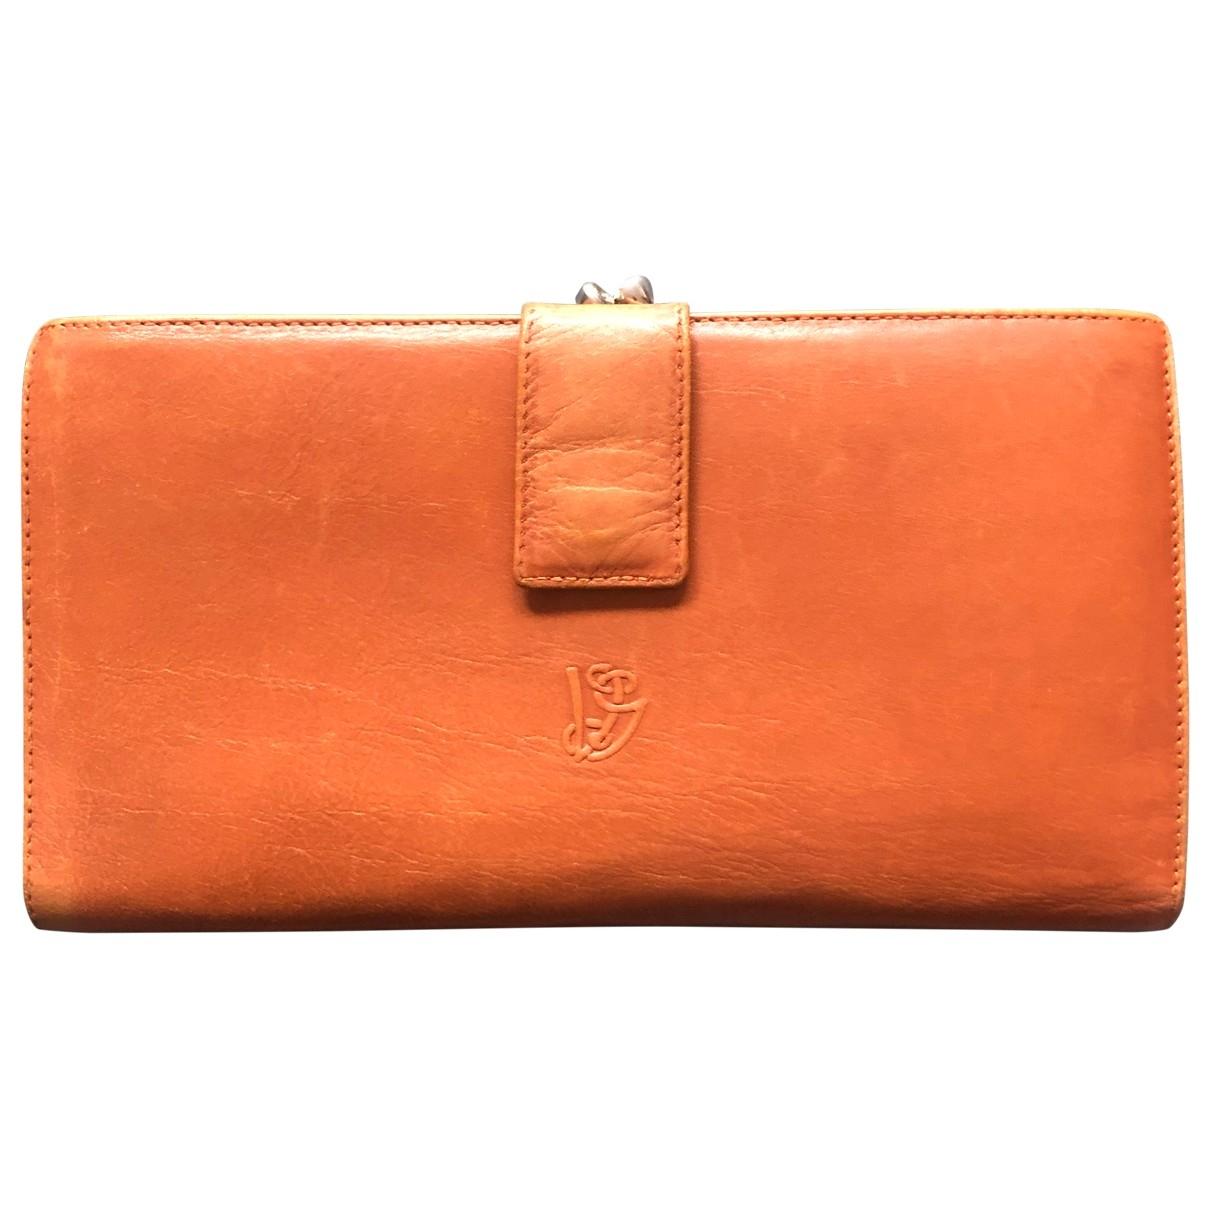 Valentino Garavani \N Leather wallet for Women \N